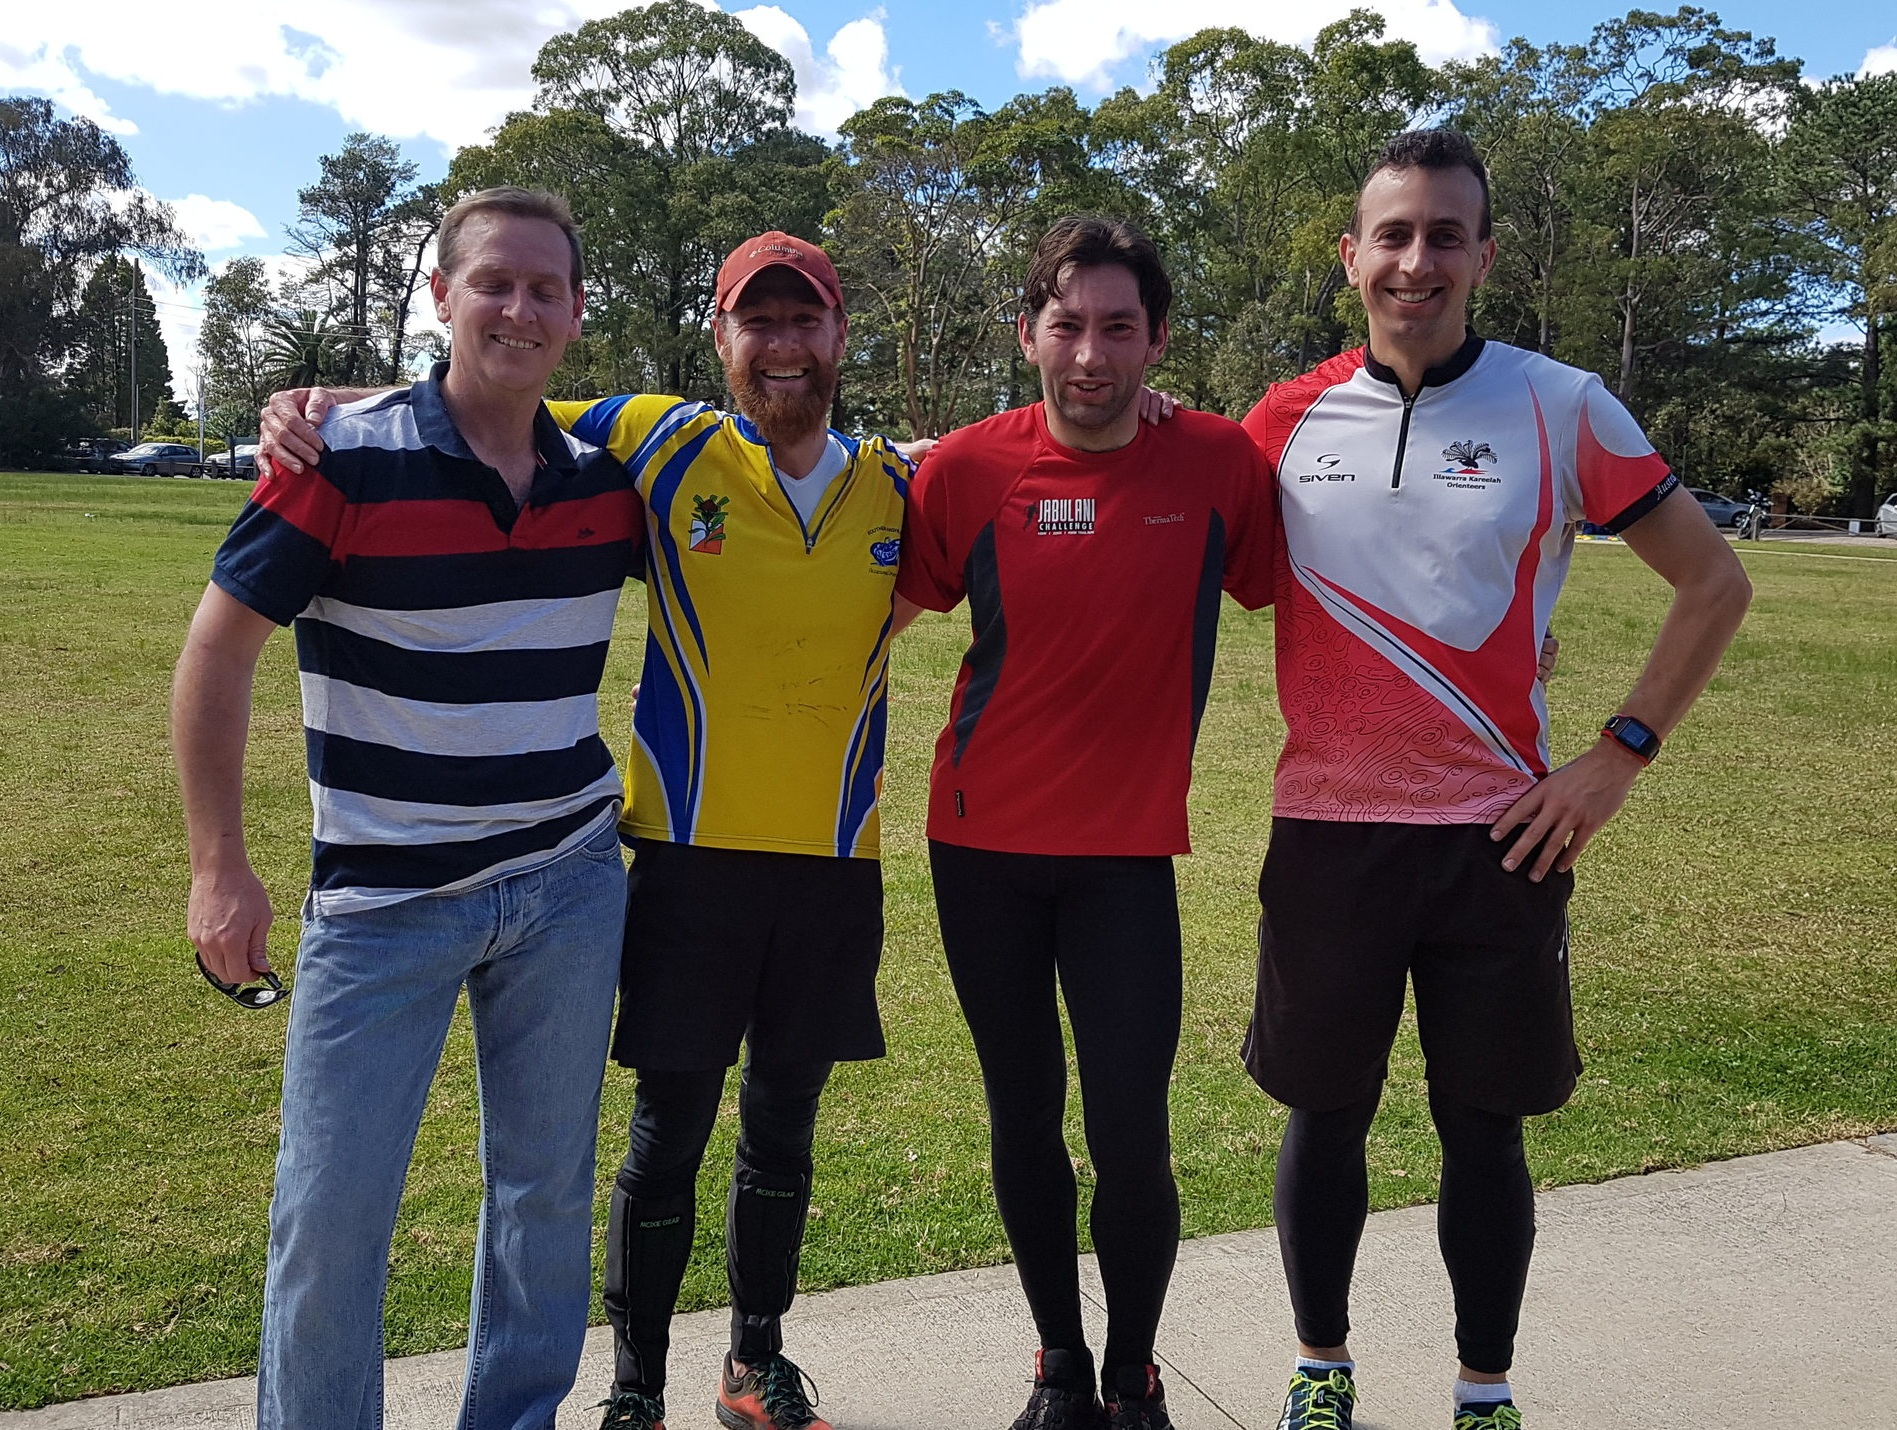 SHOO's MetrO League Division 1 team